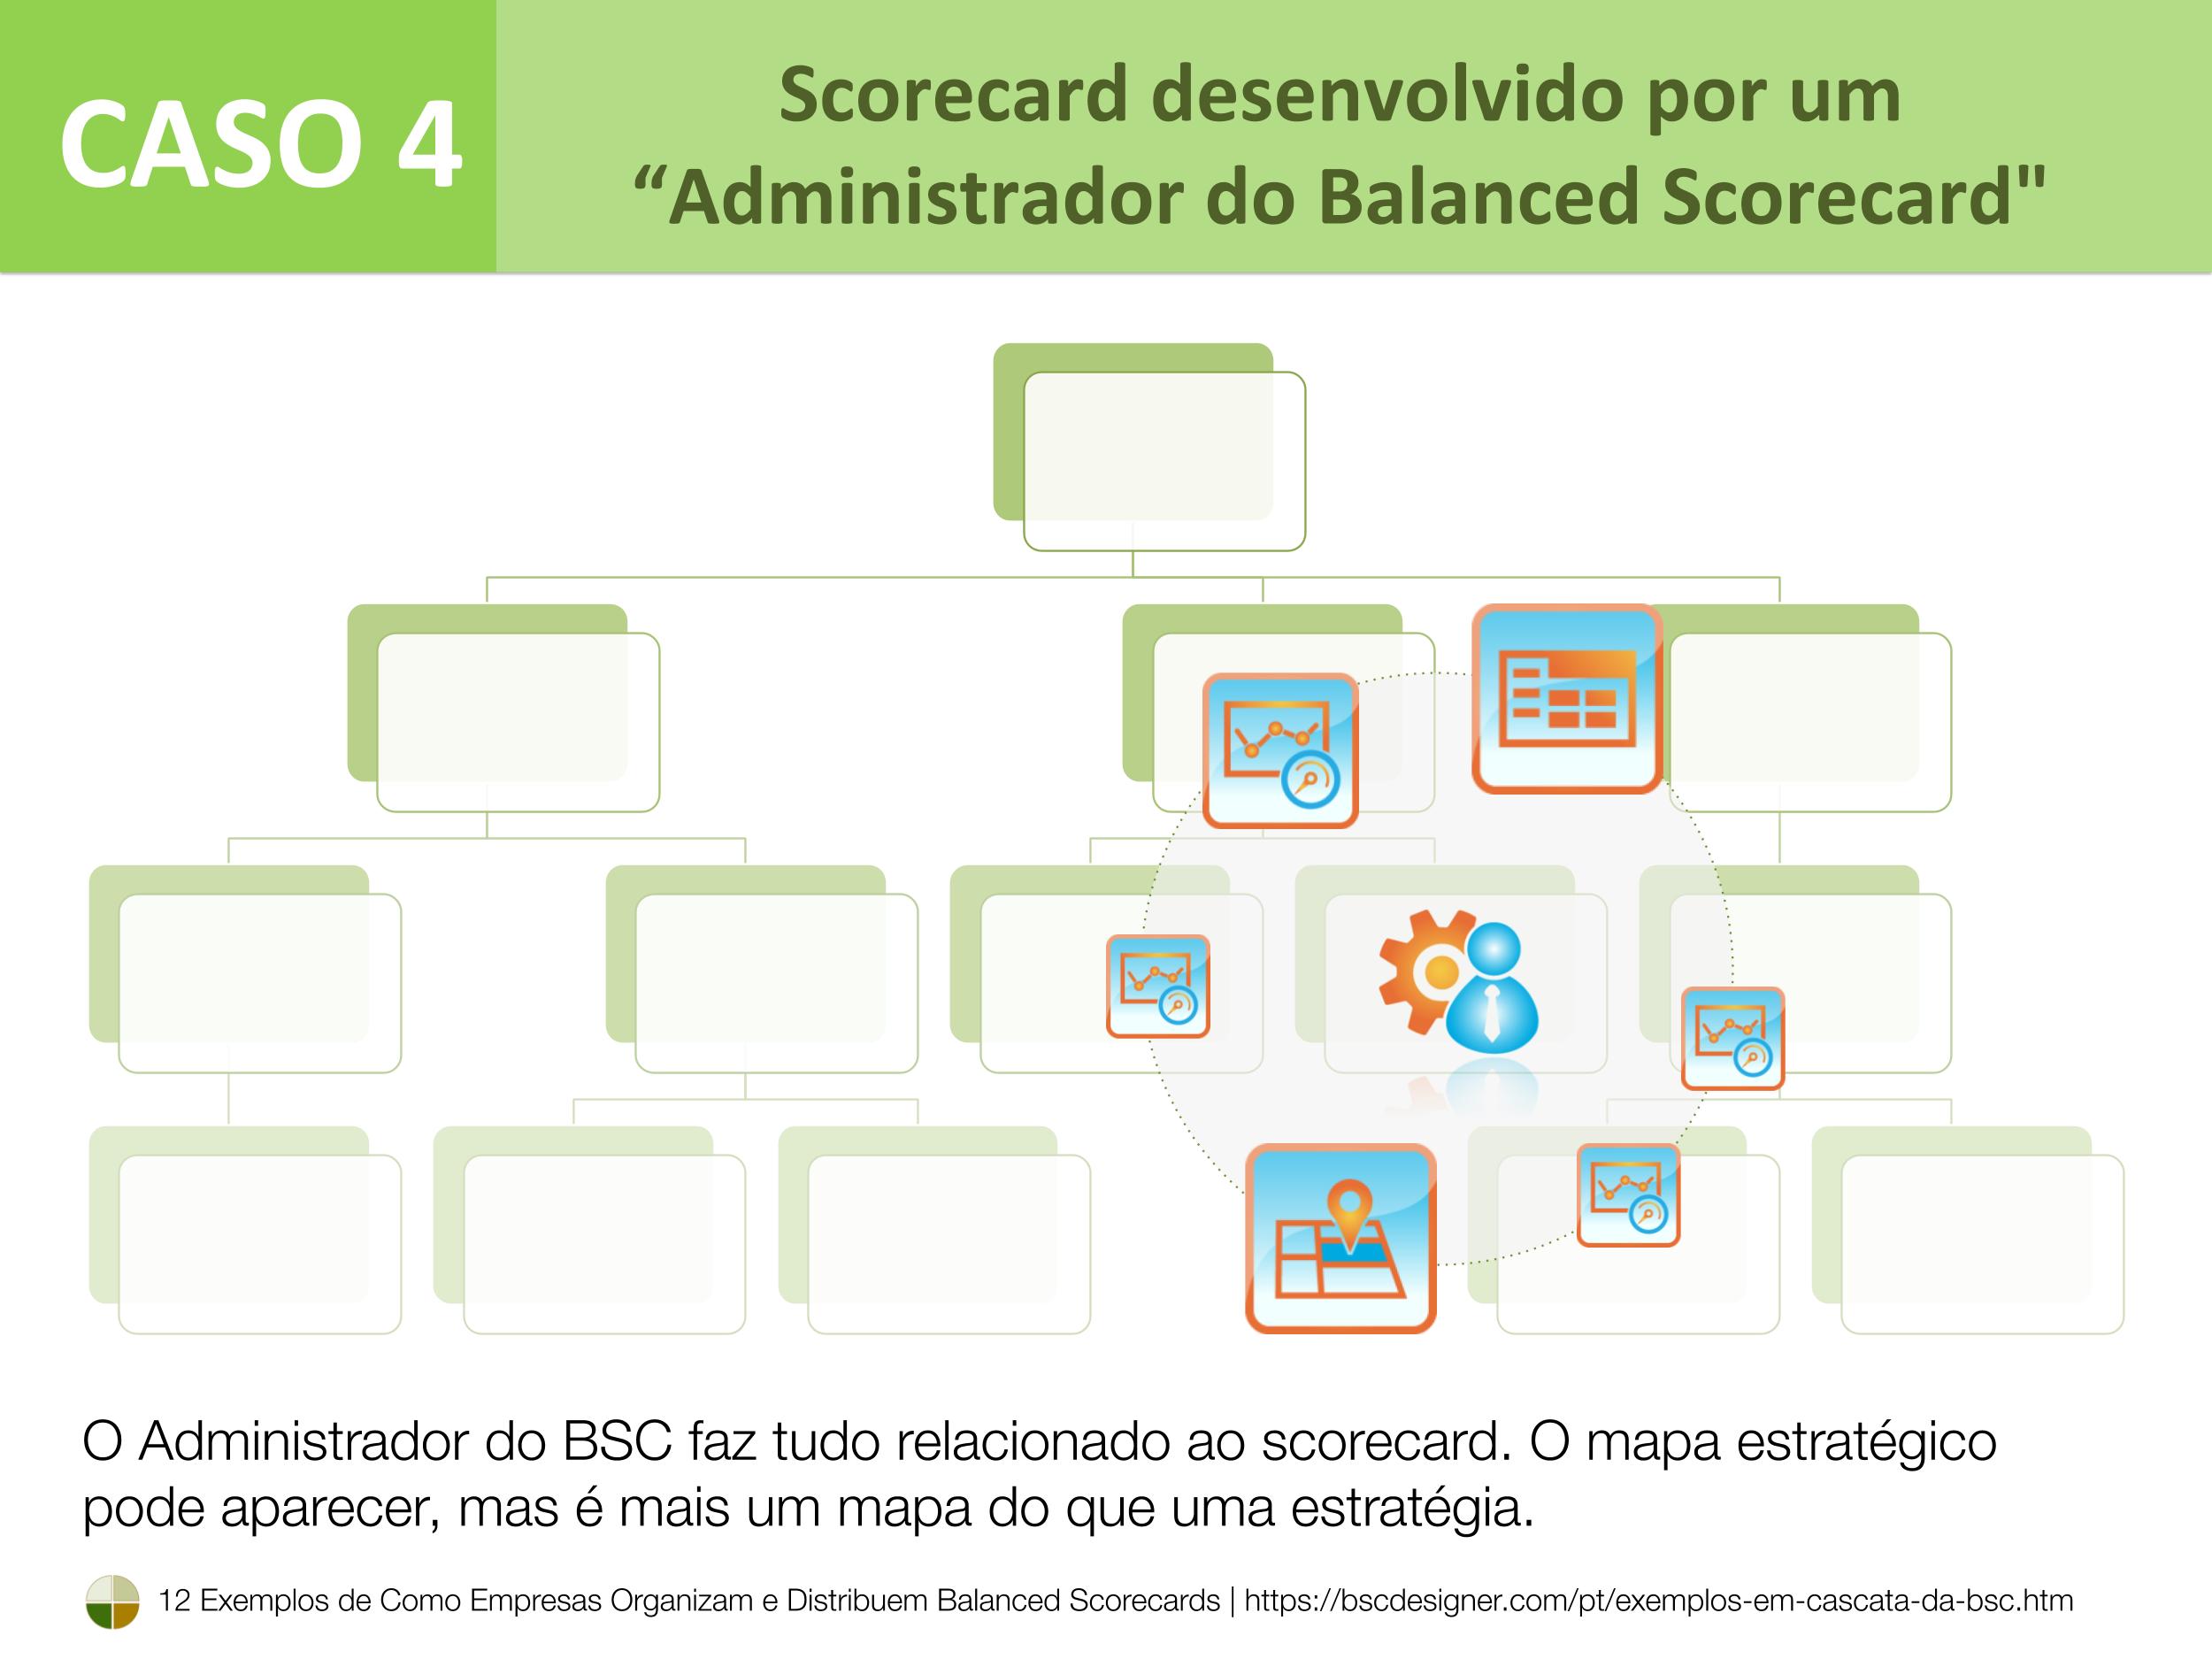 Caso 4 - Scorecard desenvolvido pelo